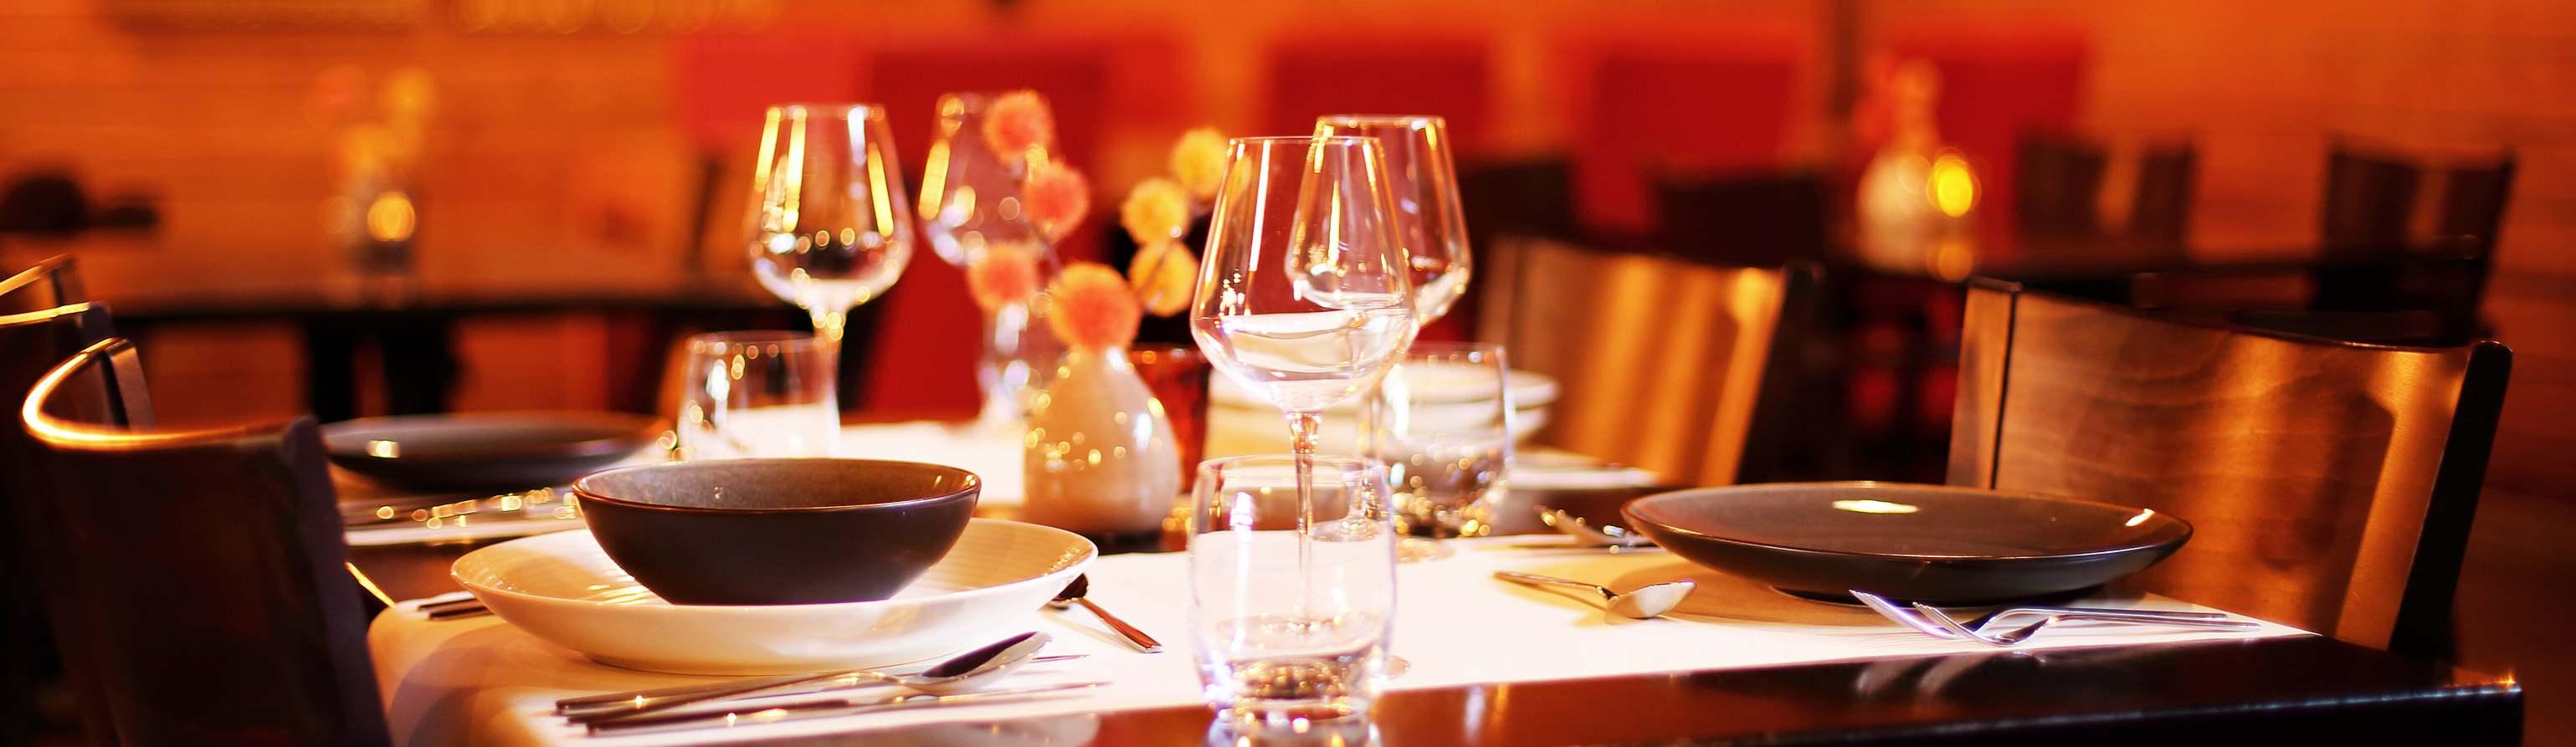 Gasterij den Heikant